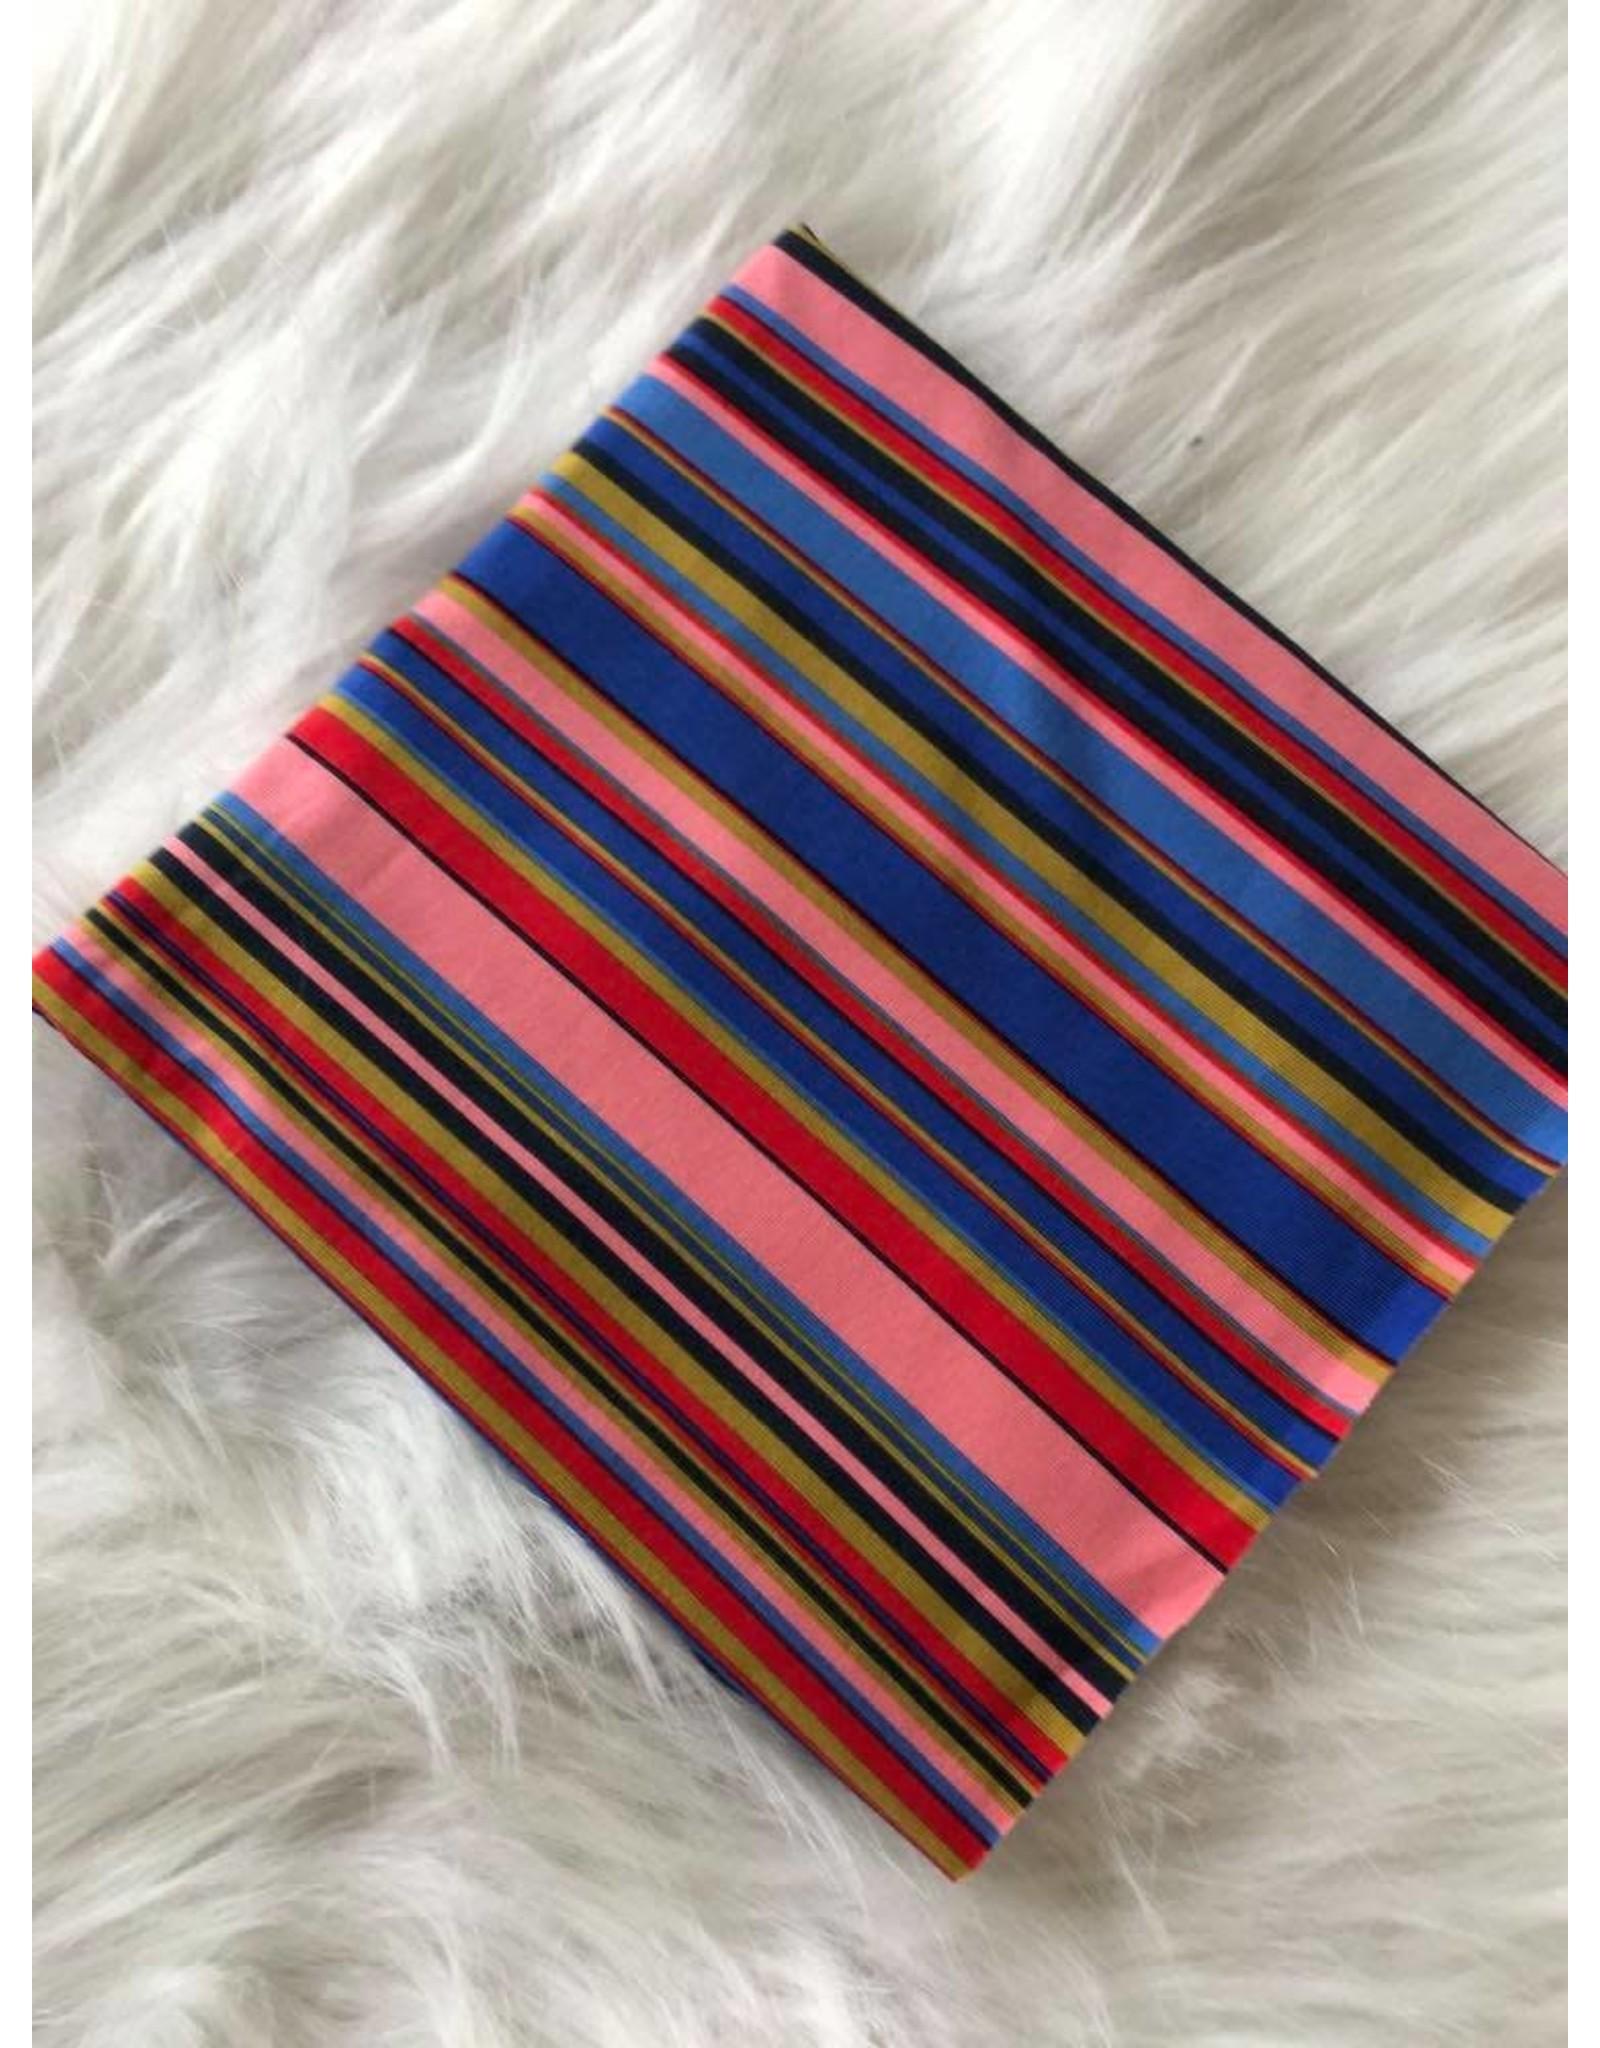 Stik-Stof Veelkleurige strepen jersey COUPON 40 cm